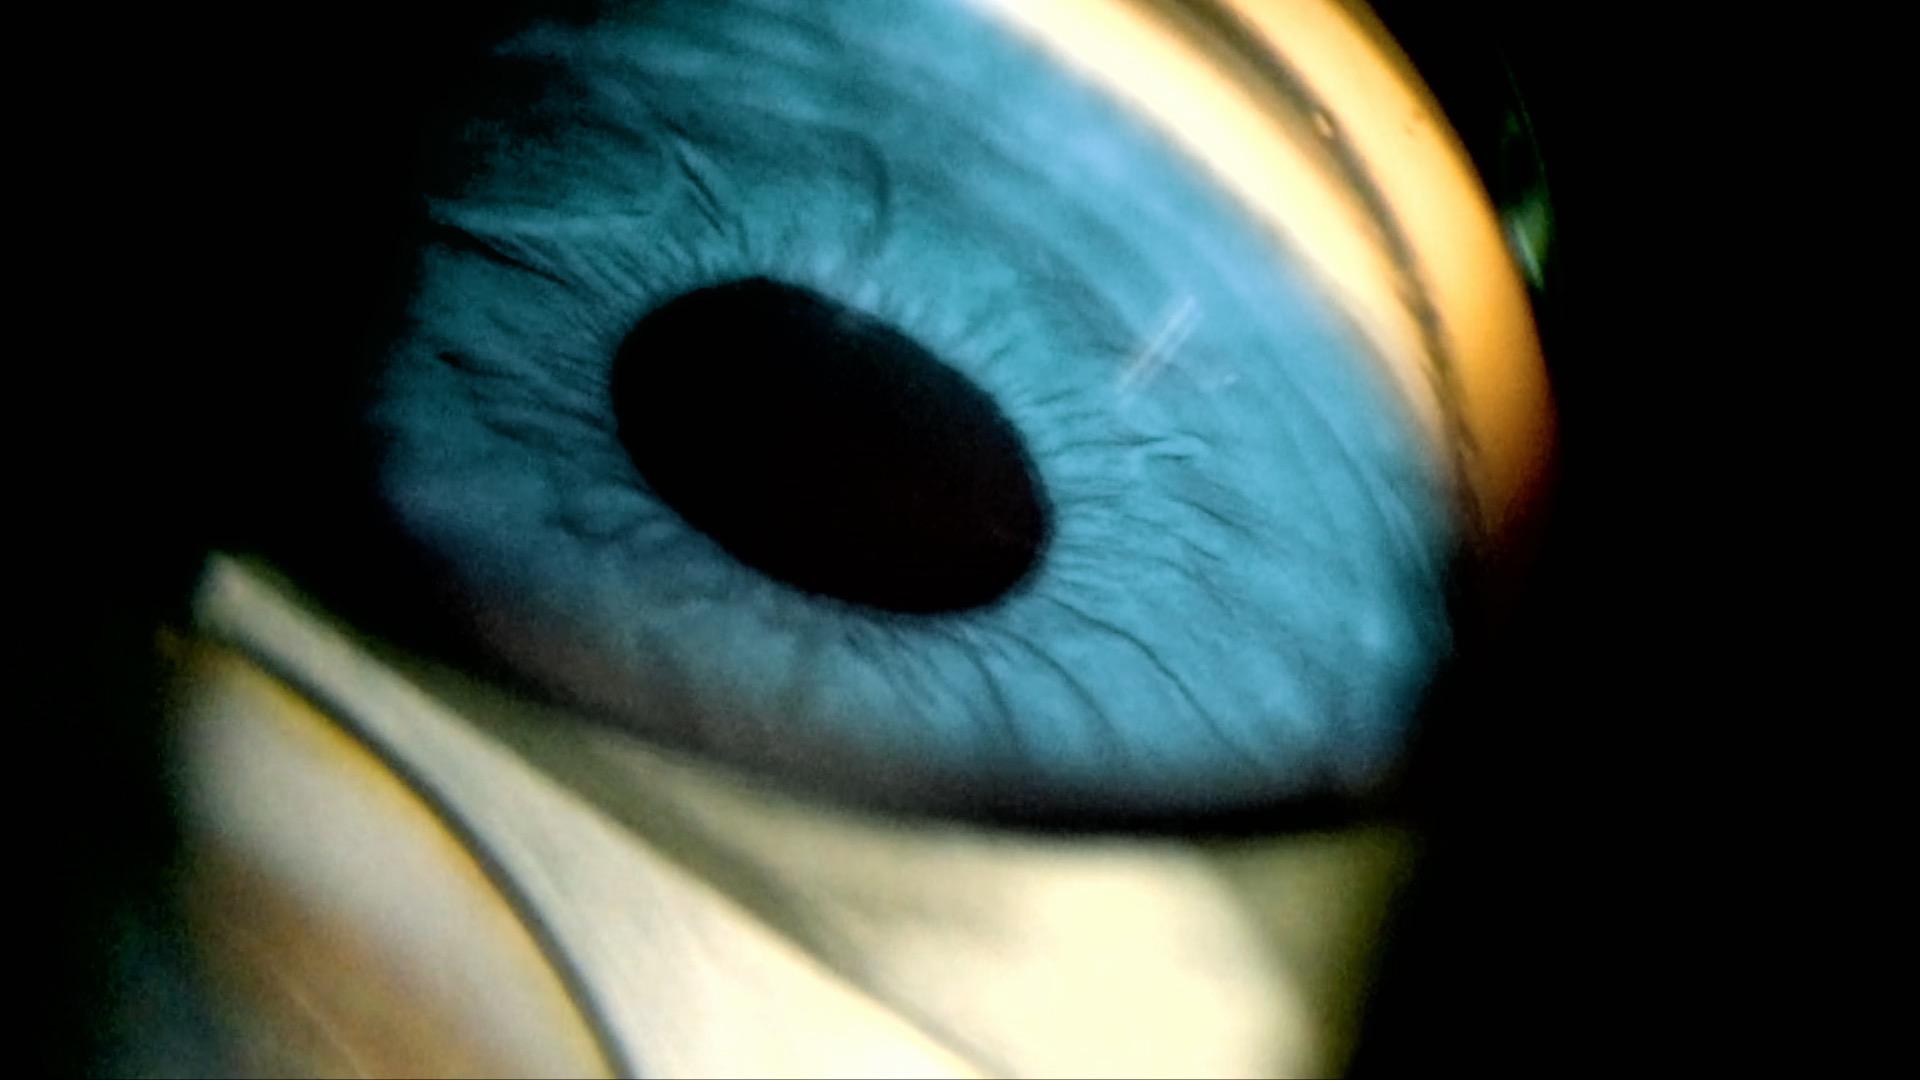 eyeball.jpg